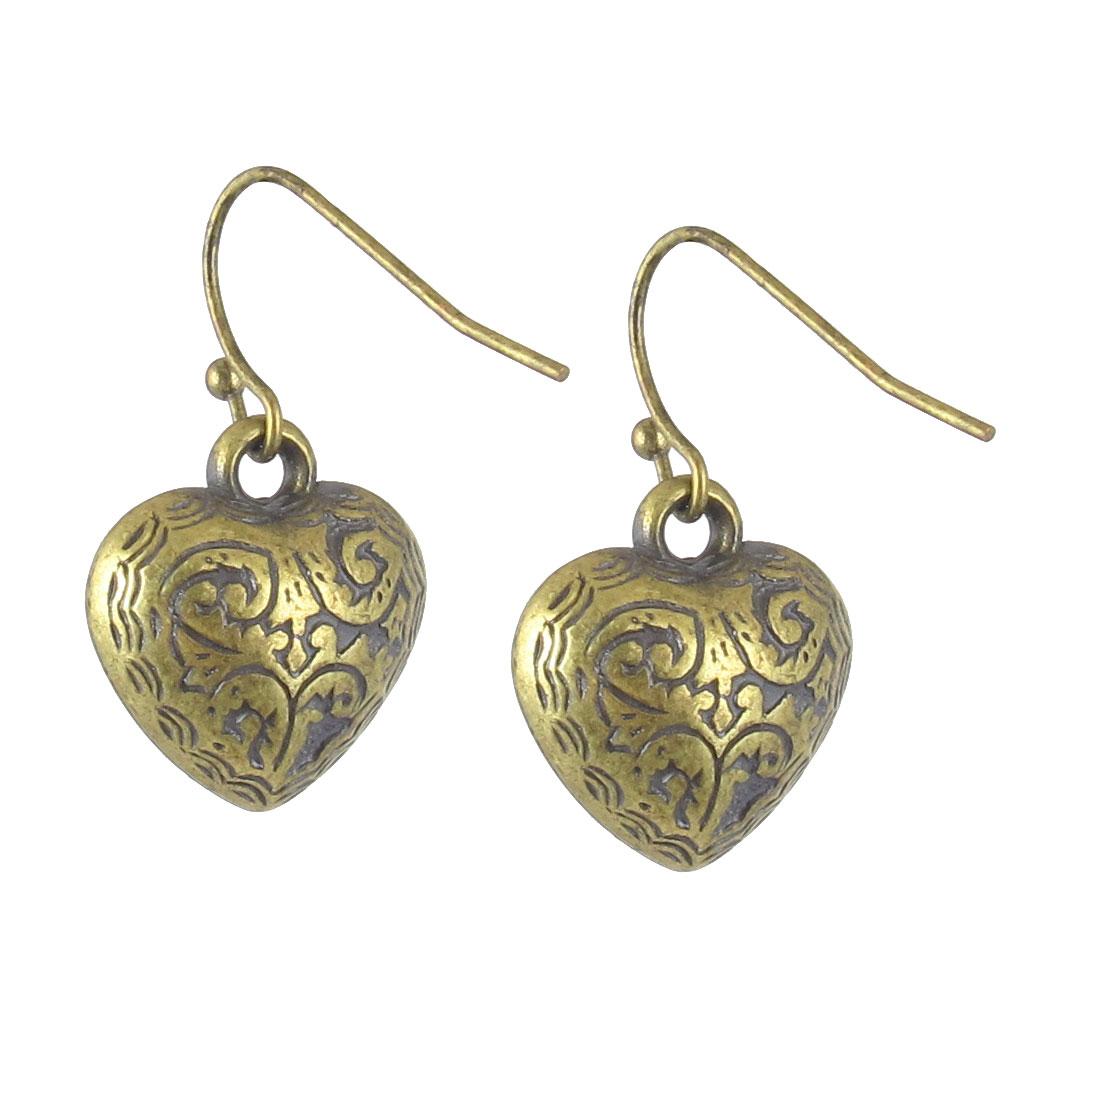 "Women Metal Filled Heart Shape Retro Style Dangling Pendant Fish Hook Earrings Earbob Bronze Tone 0.8"" Length Pair"